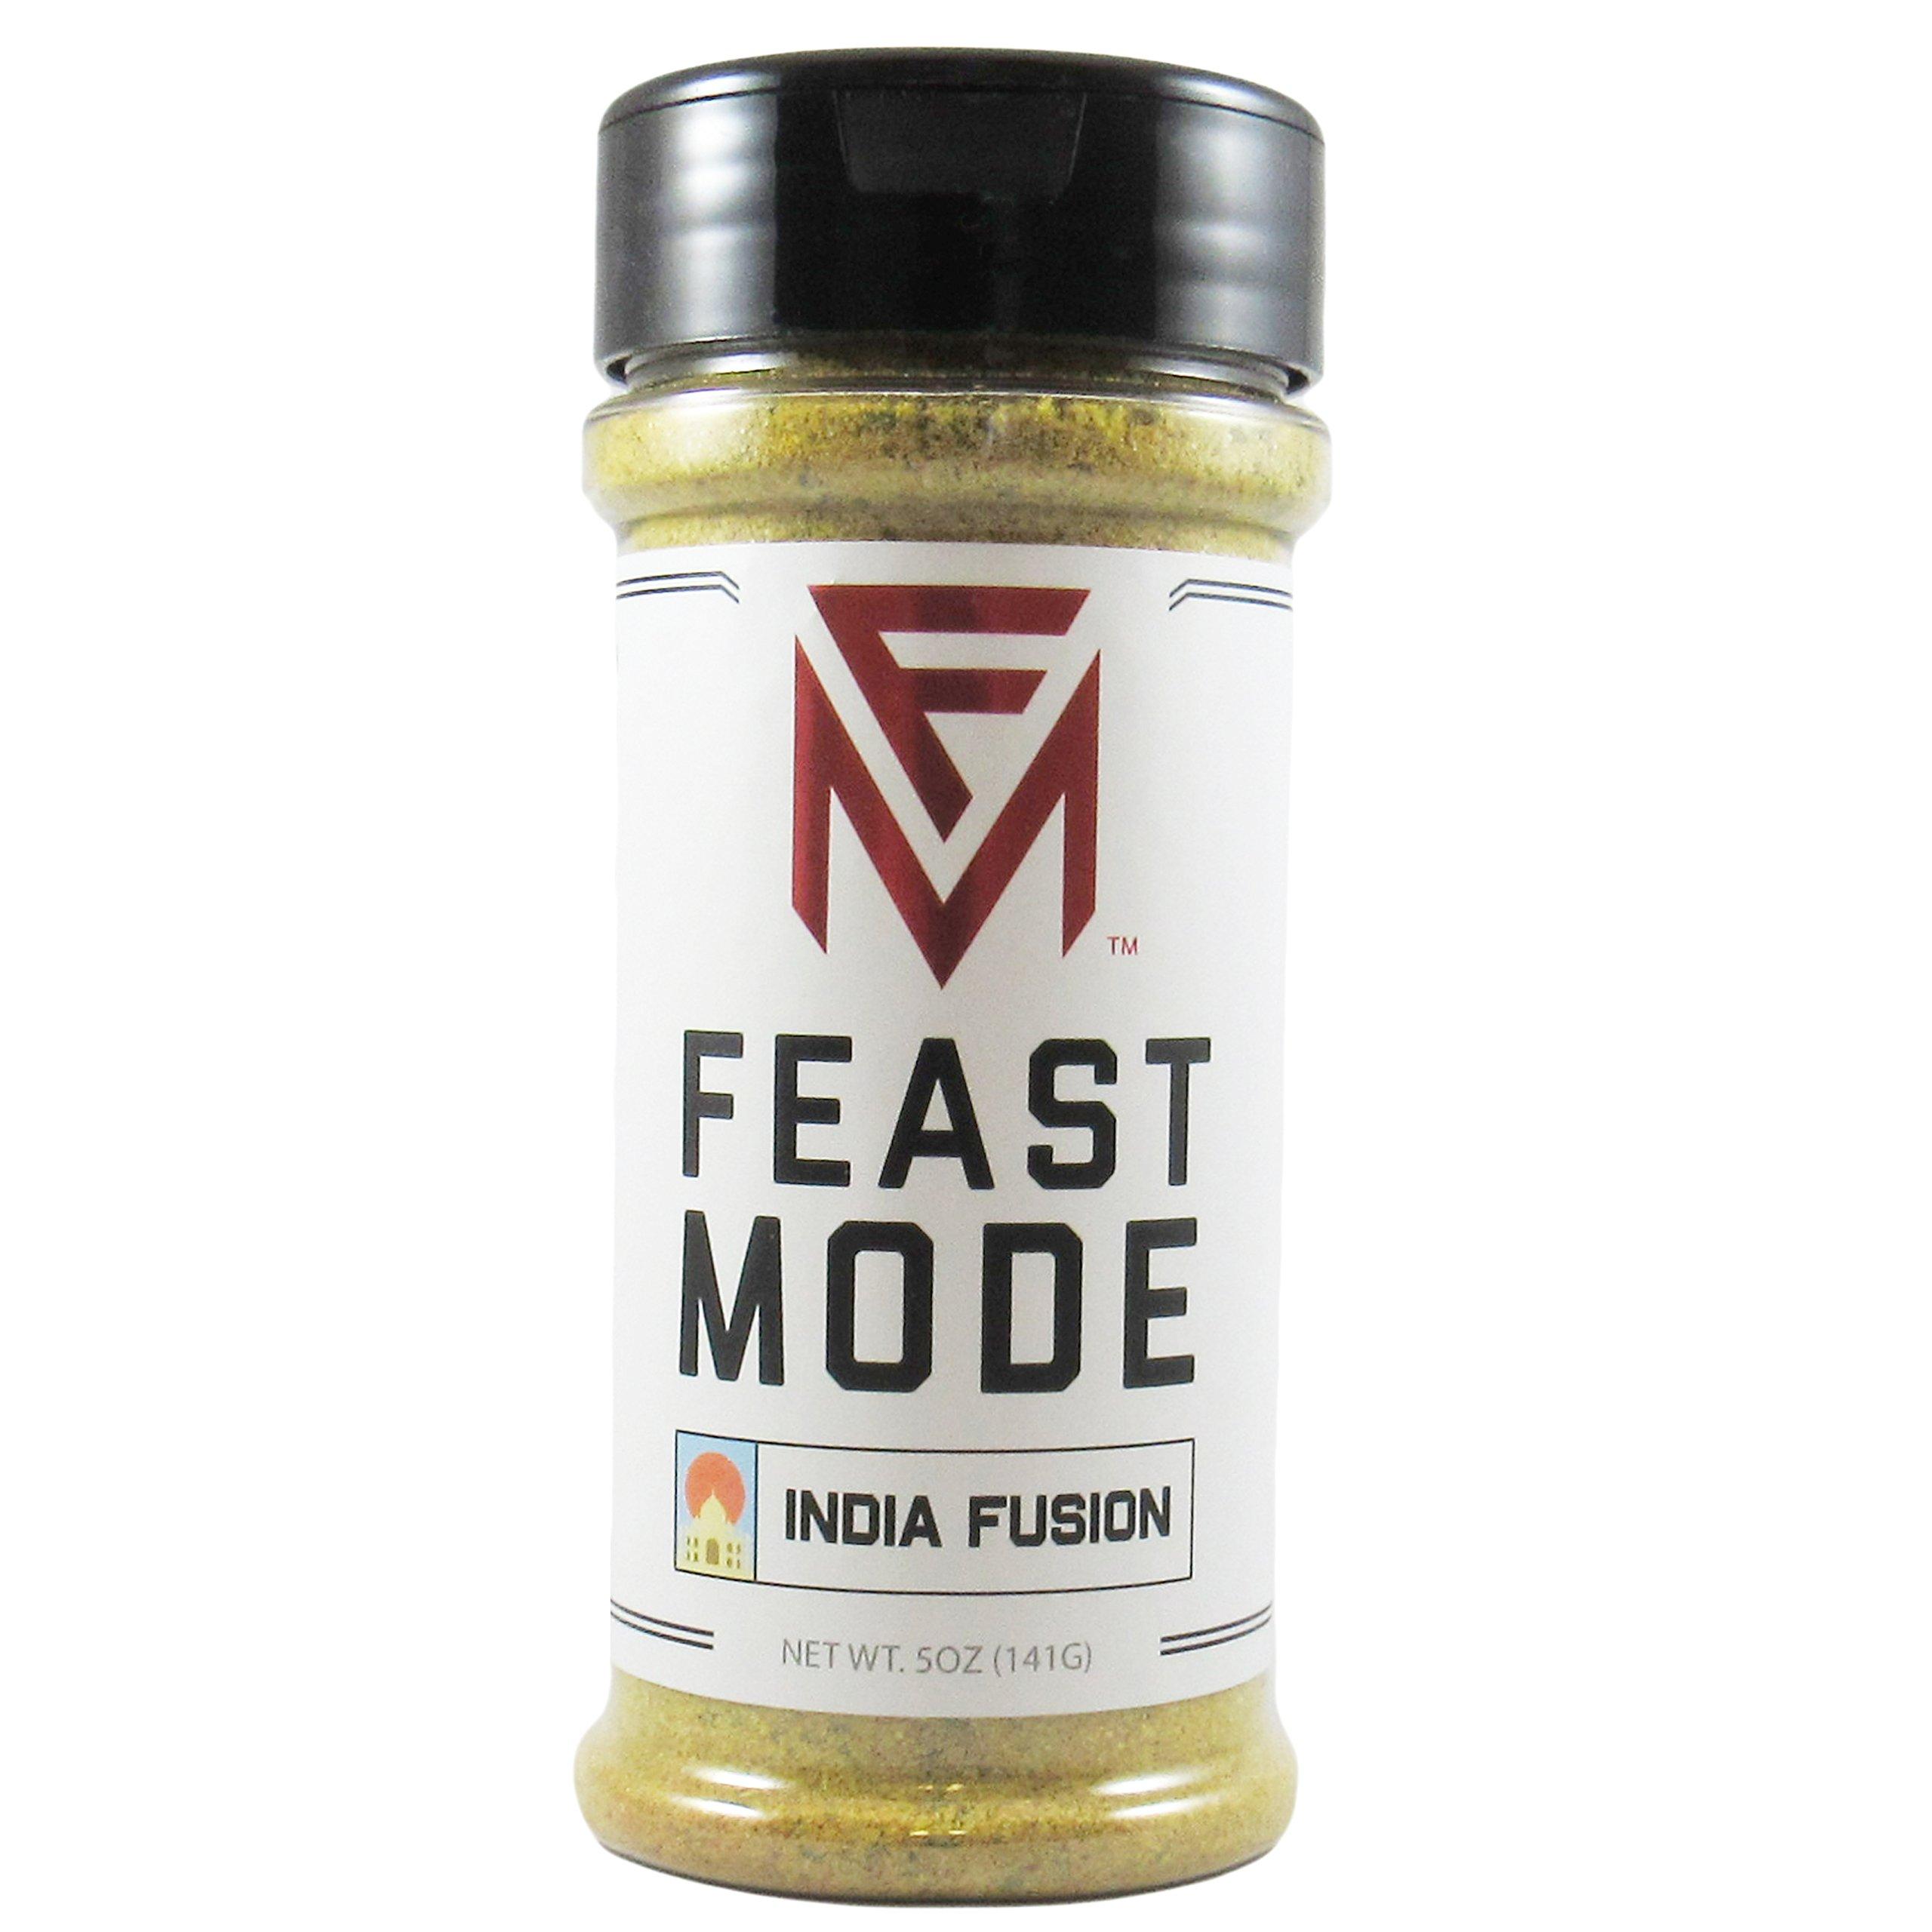 Feast Mode Flavors - India Fusion